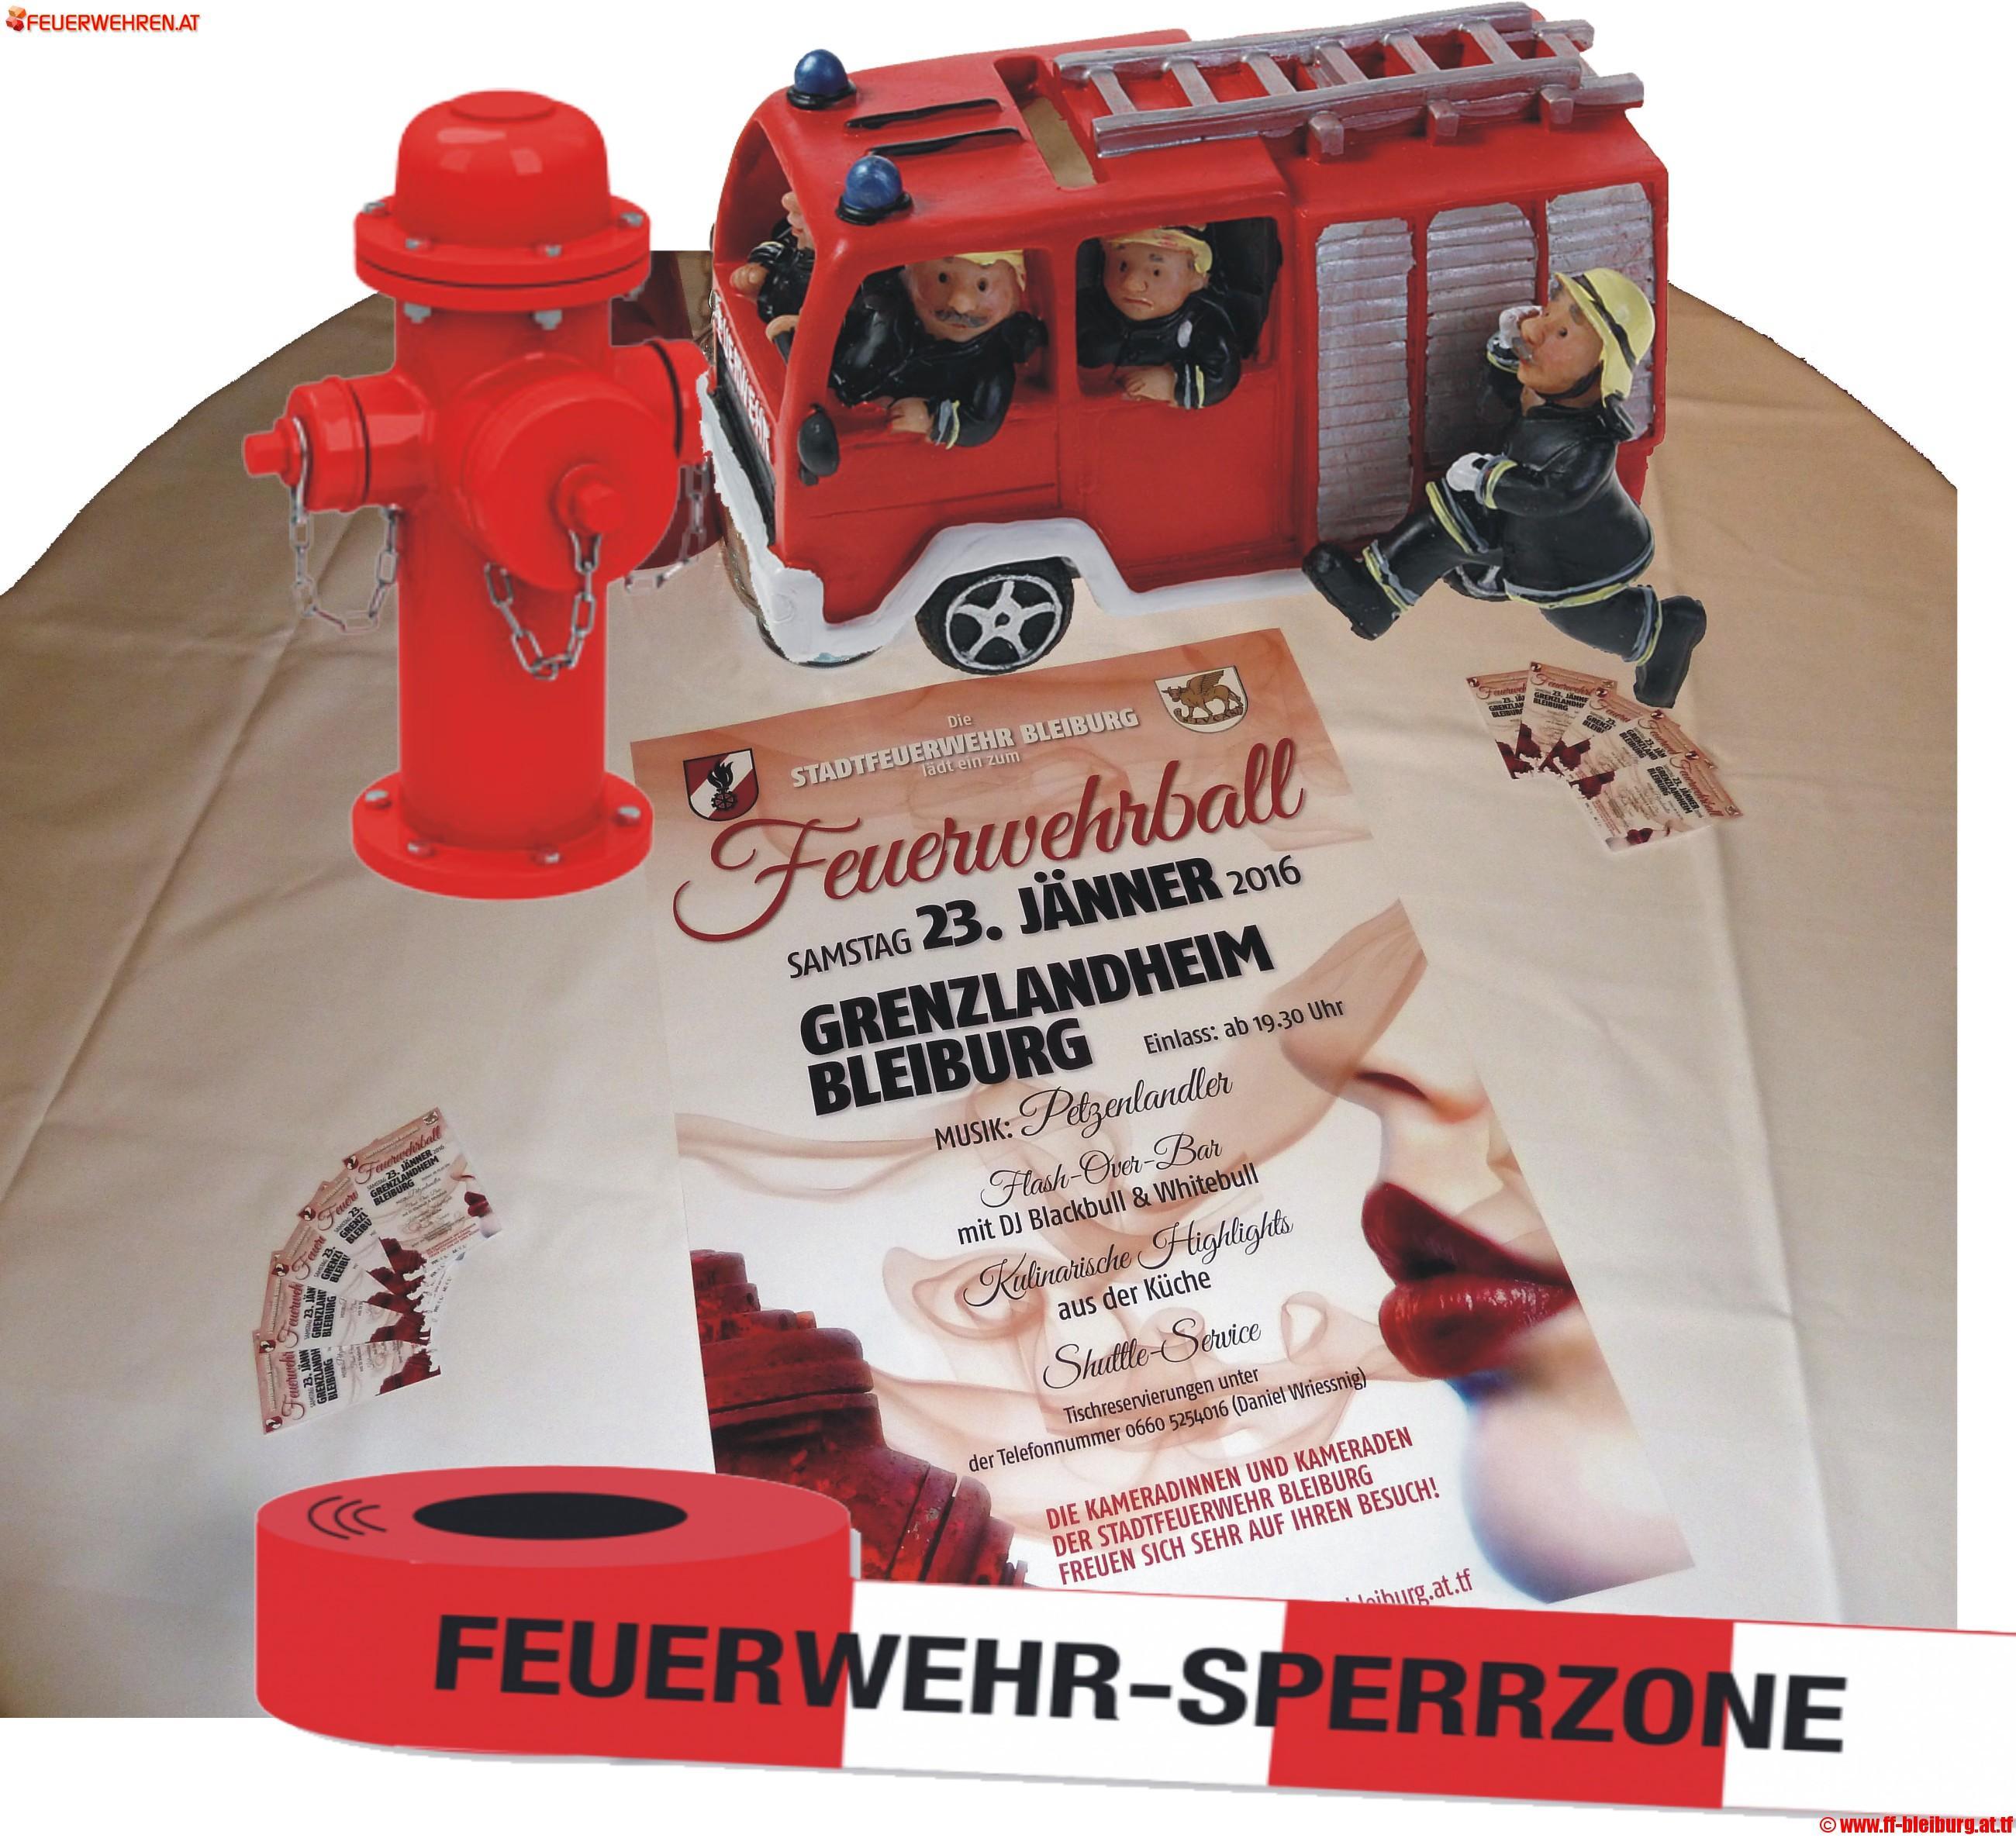 www.ff-bleiburg.at.tf